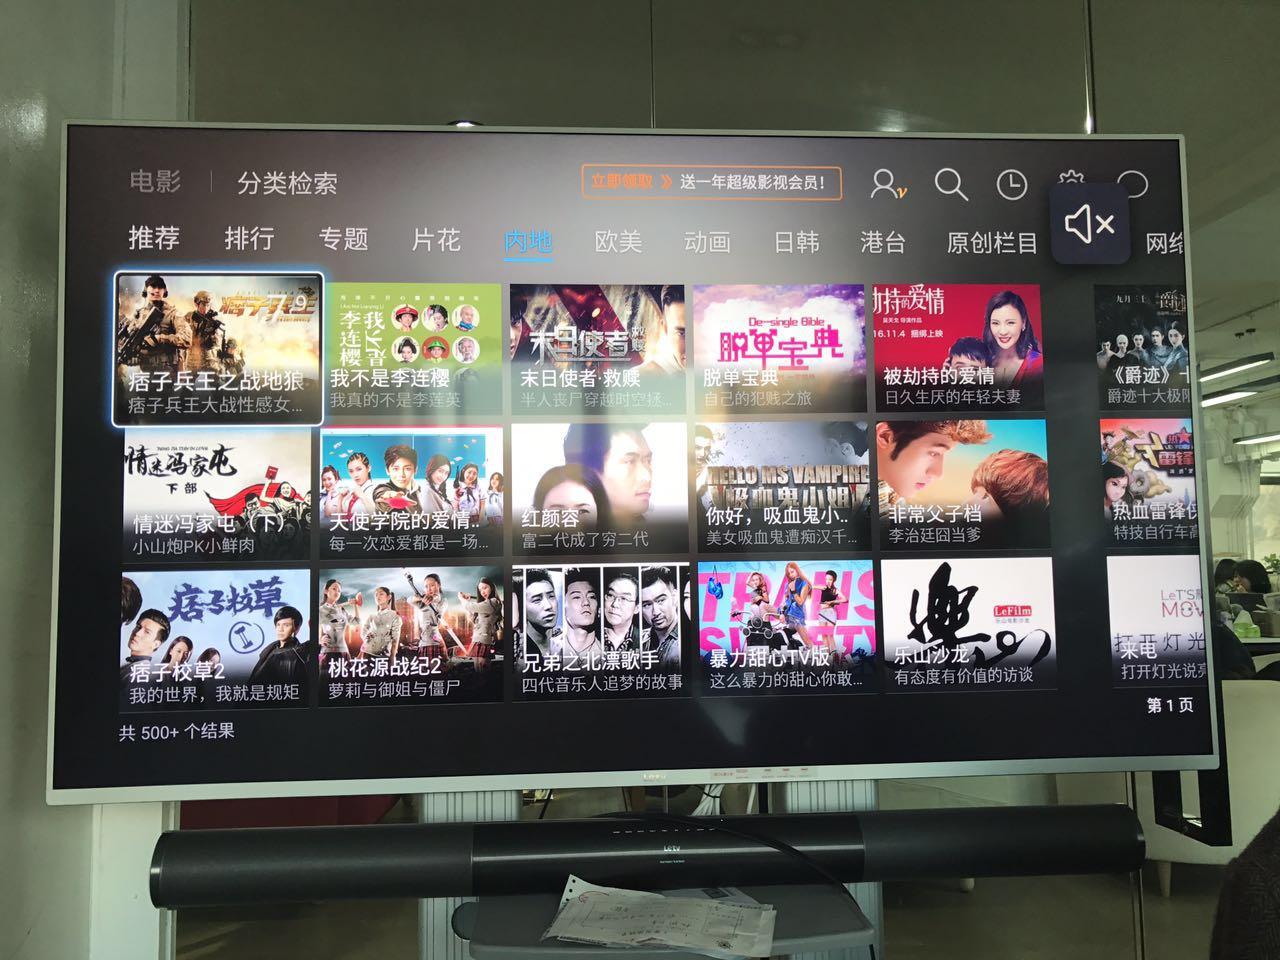 TV端-内地频道推荐